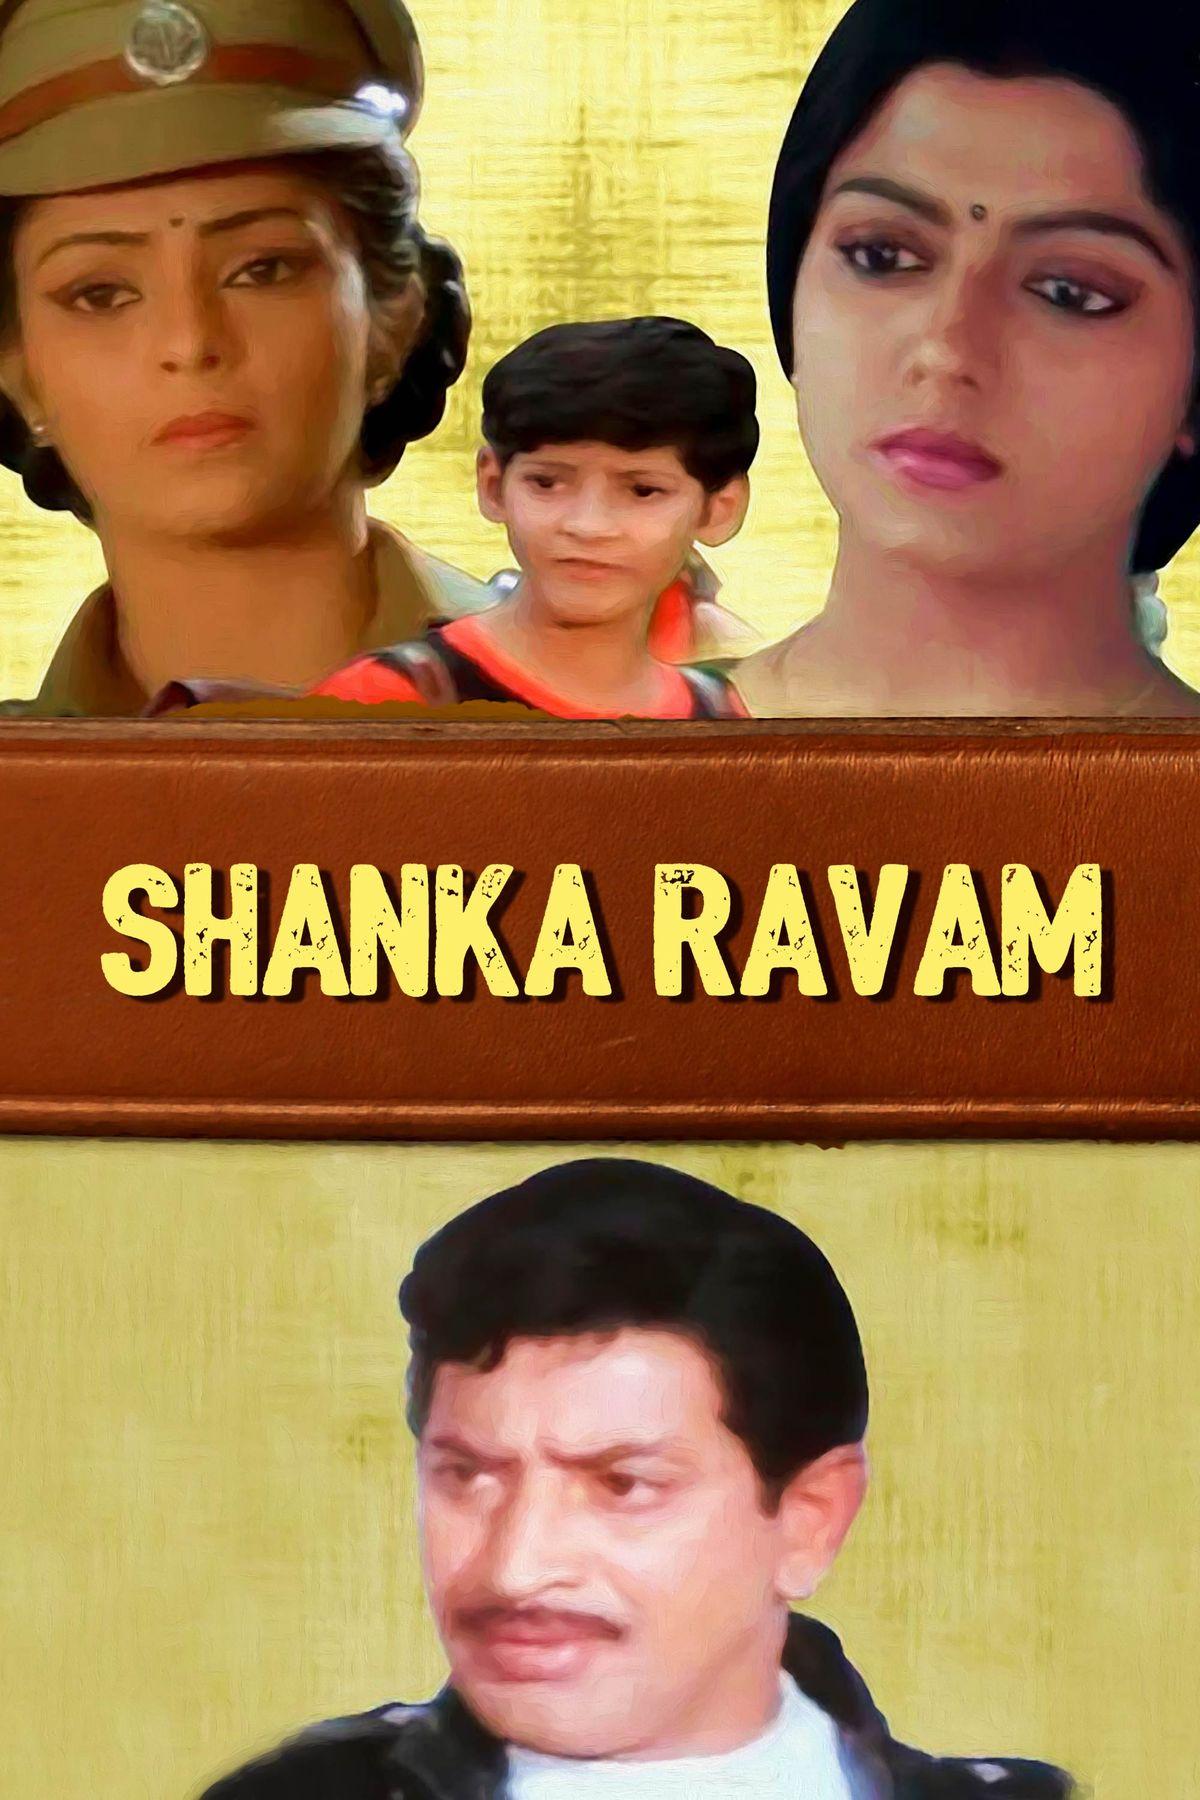 Baby Priya Best Movies, TV Shows and Web Series List